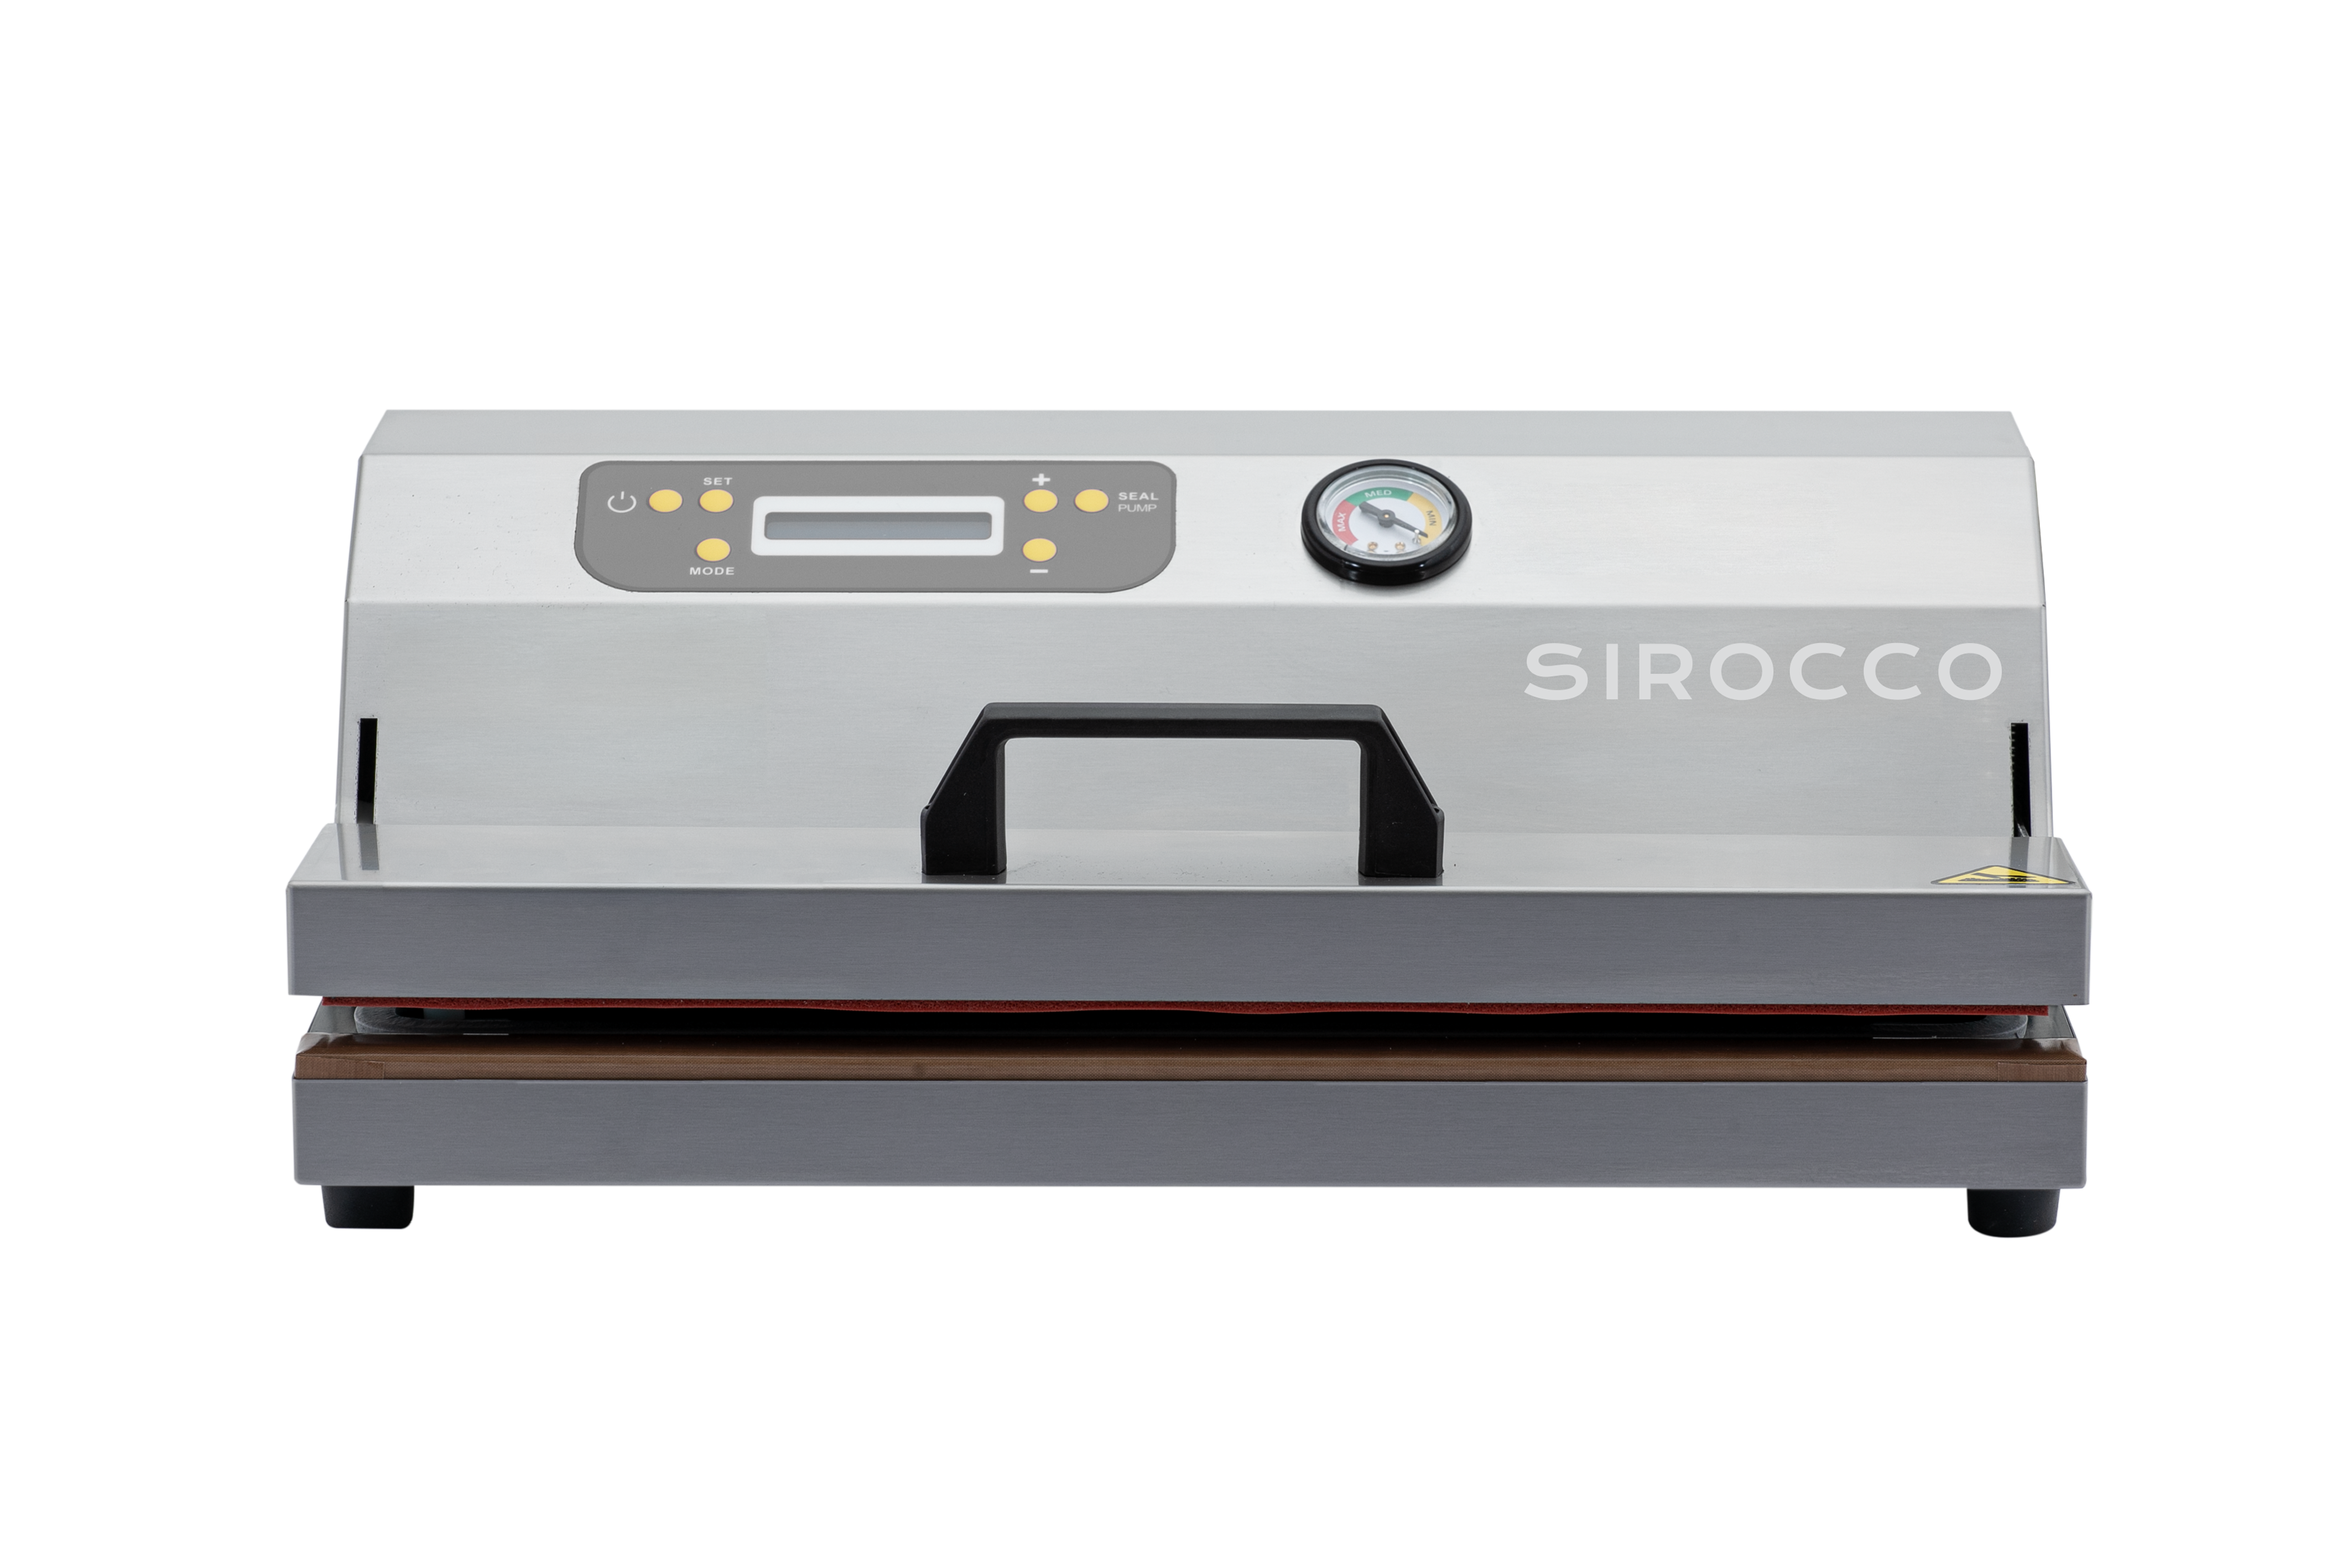 Eurodib USA Sirocco external vacuum packaging machines